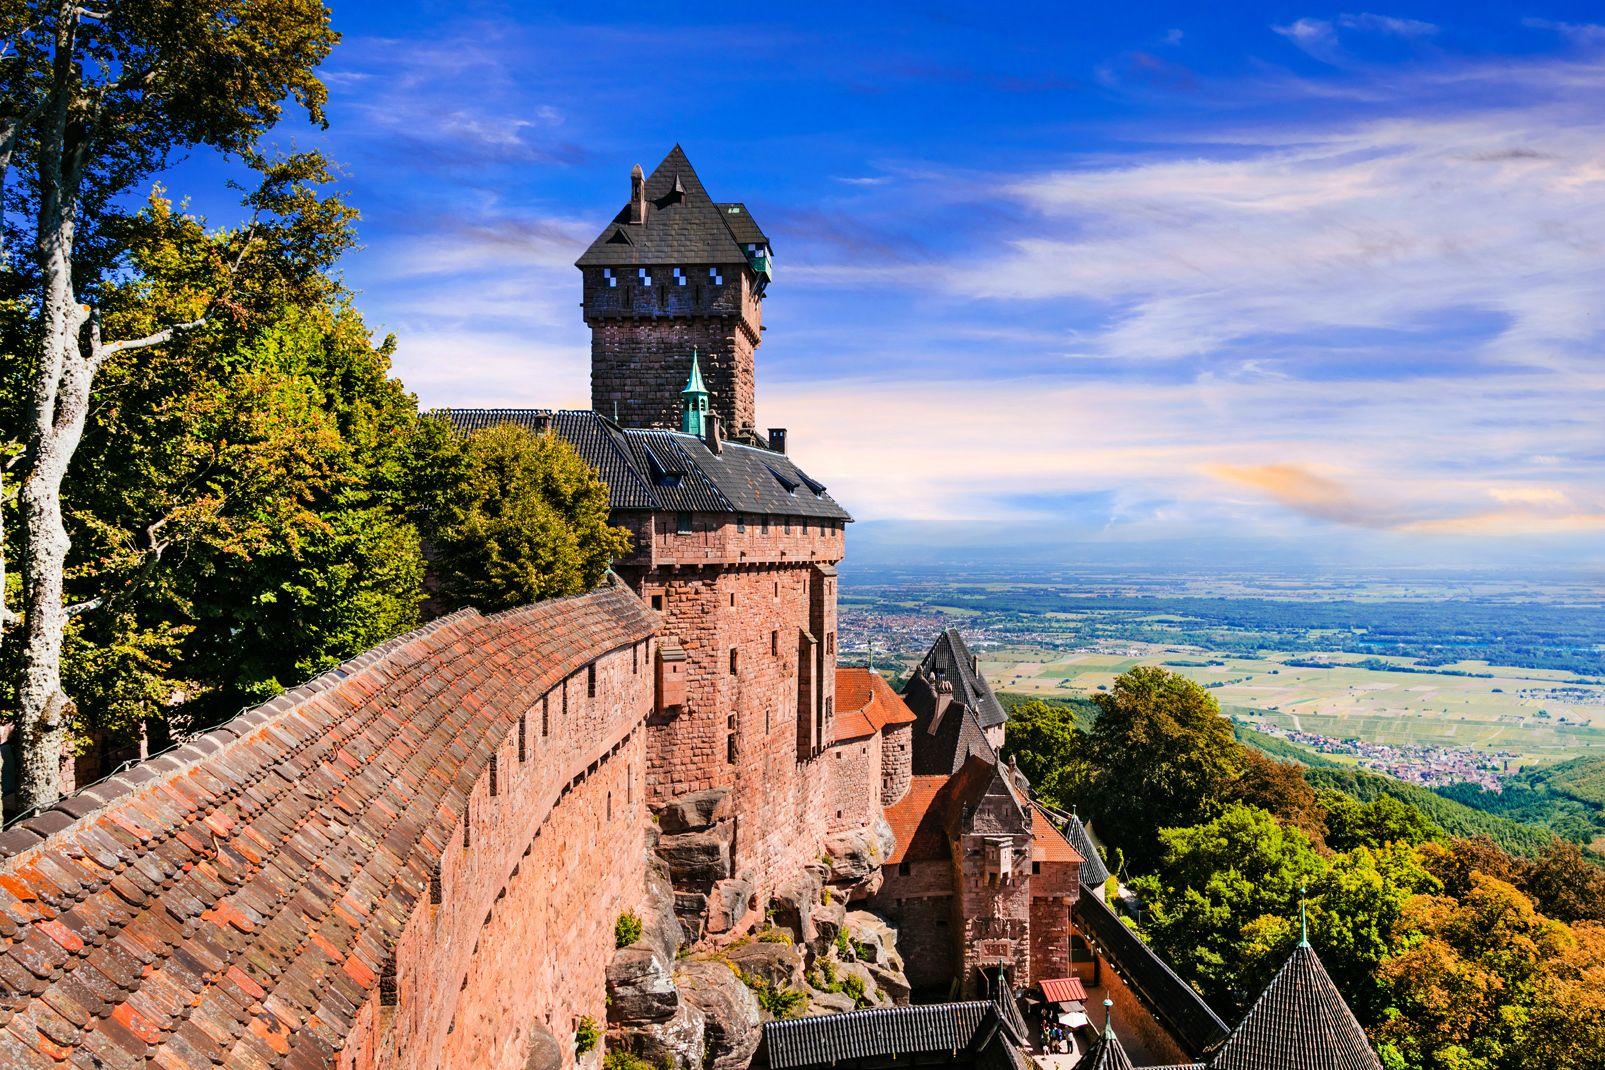 Alsace, France, Europe, Haut-Koenigsbourg, chateau, forteresse